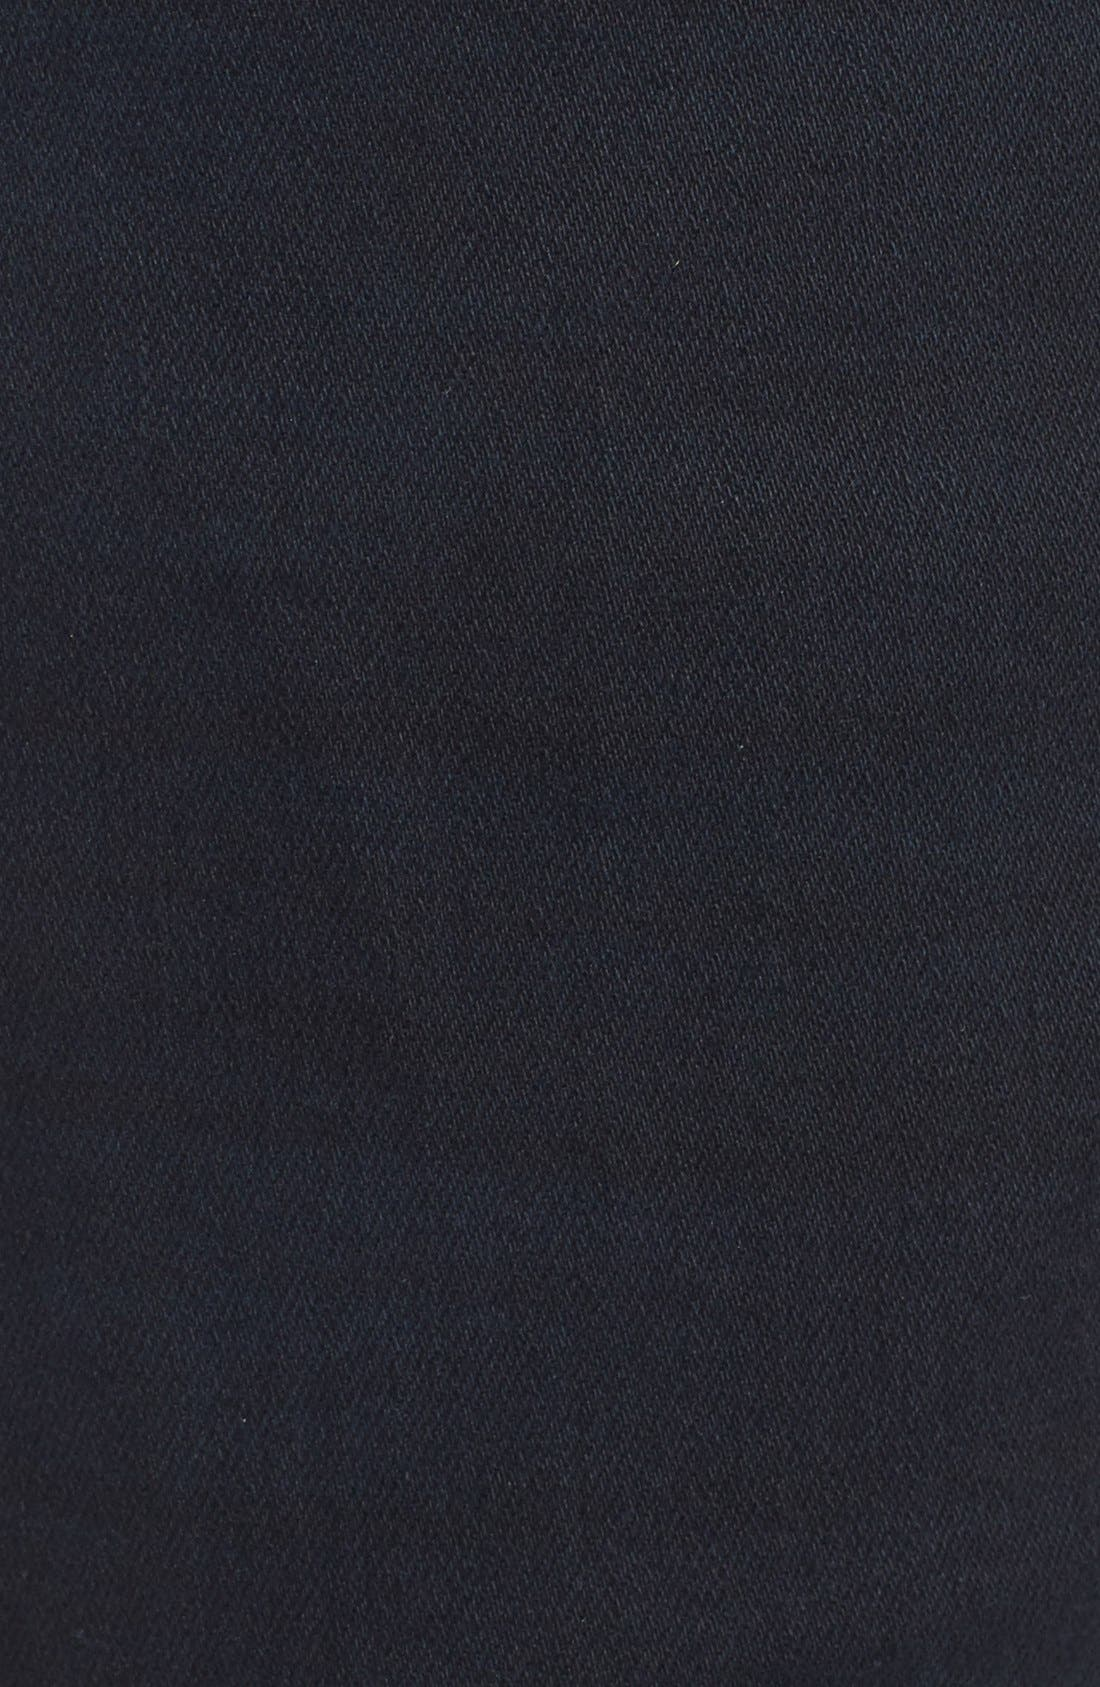 Gage Slim Straight Leg Jeans,                             Alternate thumbnail 10, color,                             401